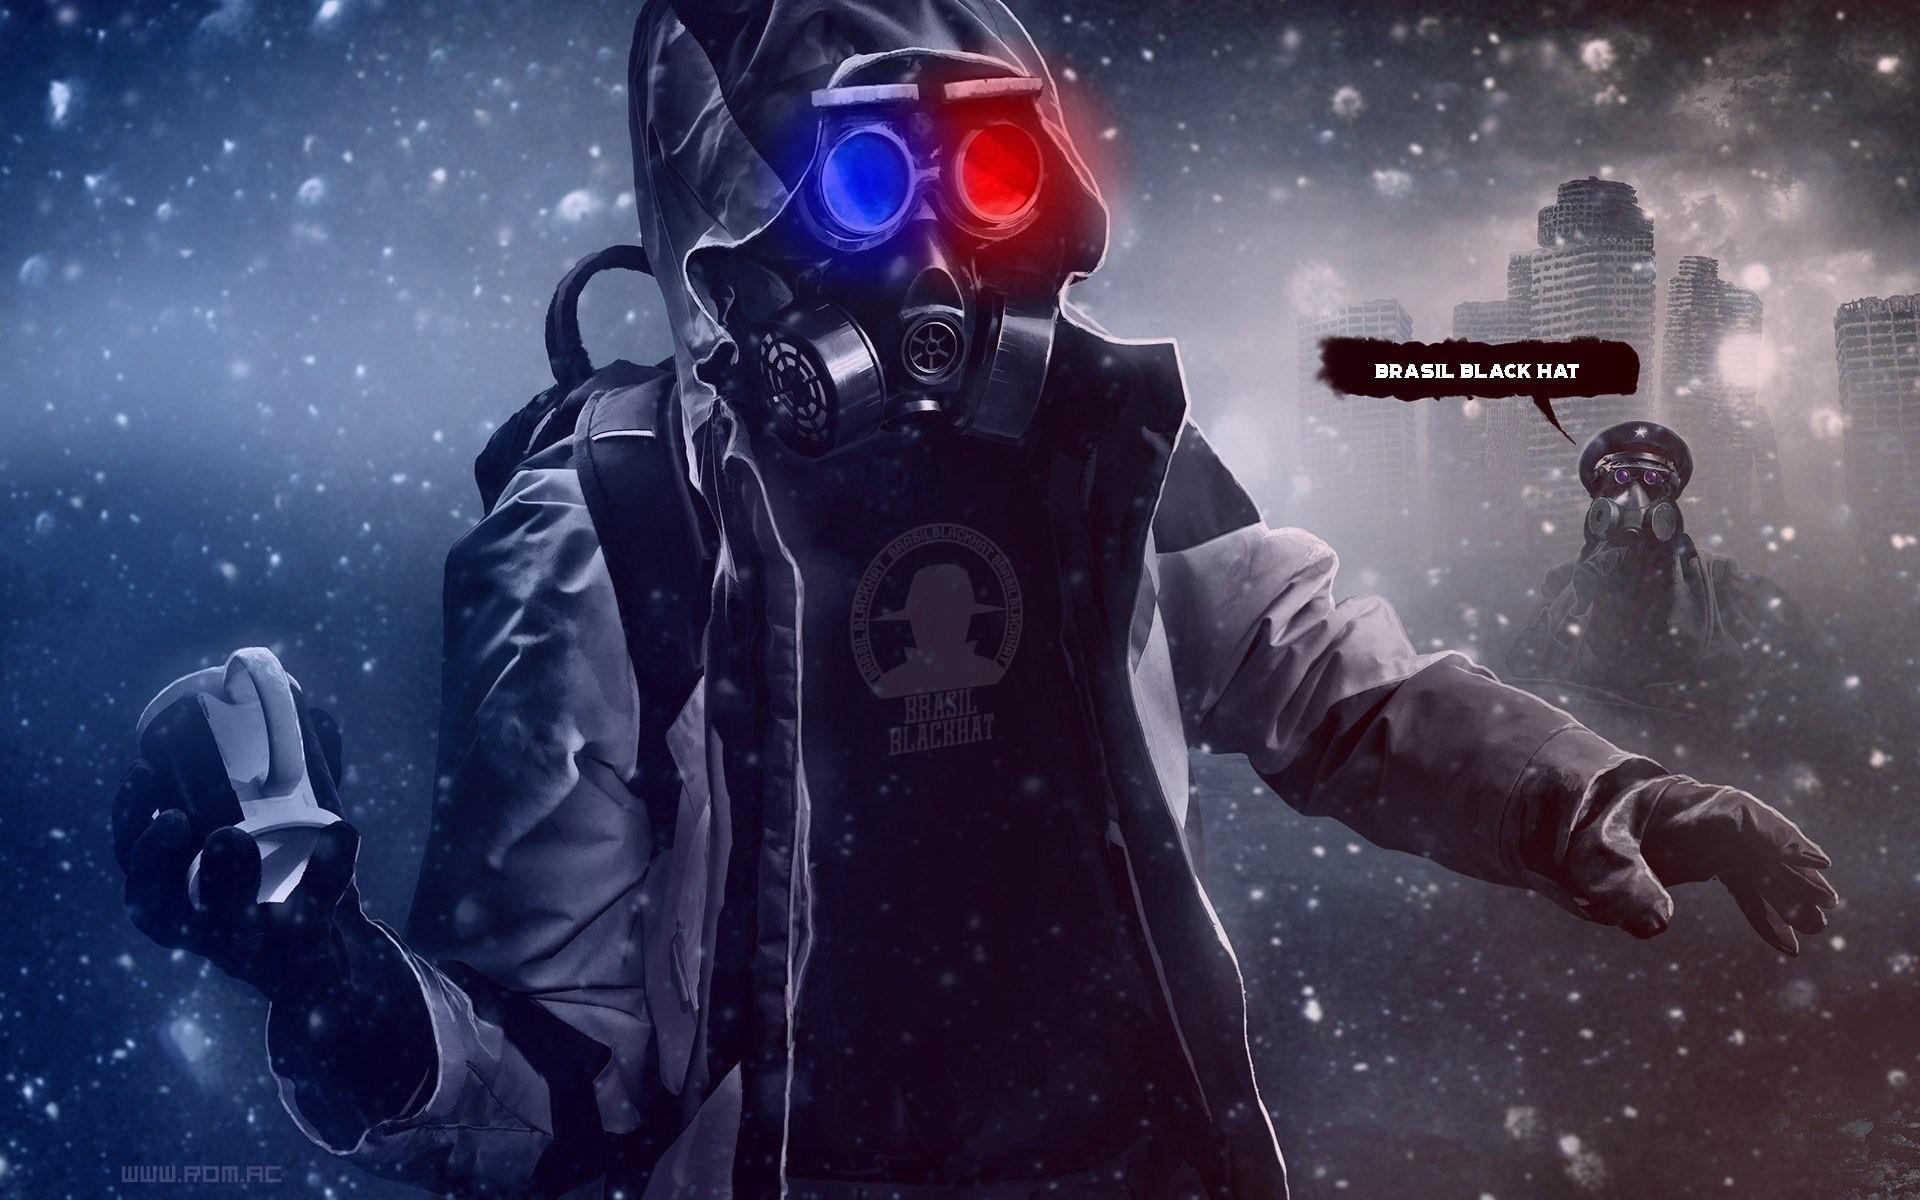 Mask War Man Brasil Blackhat Grenade Soldier Contamination Danger Wallpaper  At Dark Wallpapers